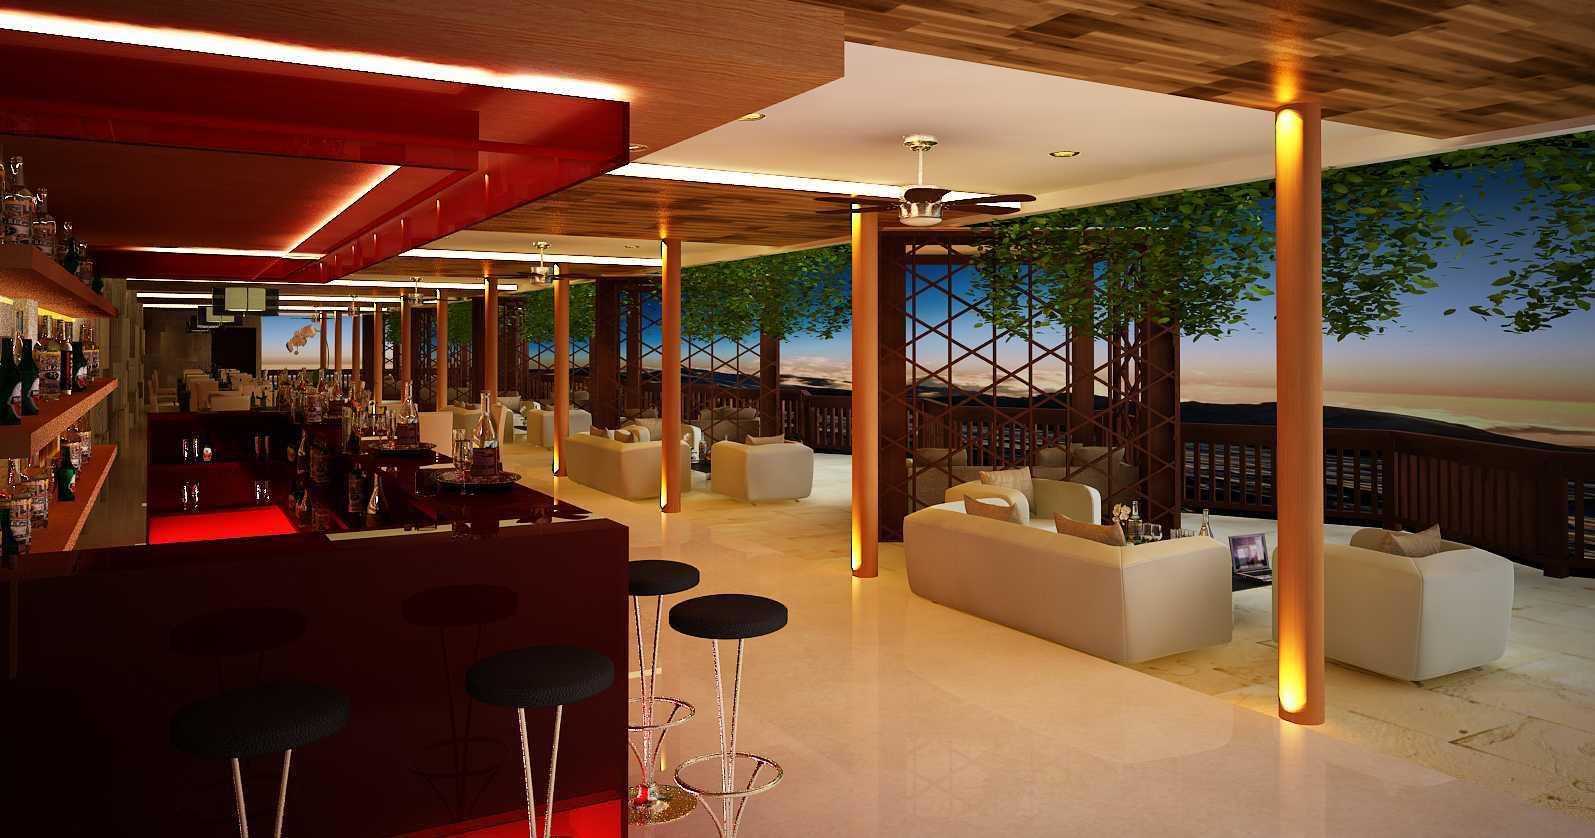 Made Dharmendra Architect Sanur Green View Hotel Sanur, Denpasar Sel., Kota Denpasar, Bali, Indonesia Sanur, Denpasar Sel., Kota Denpasar, Bali, Indonesia Bar Area Kontemporer  49486